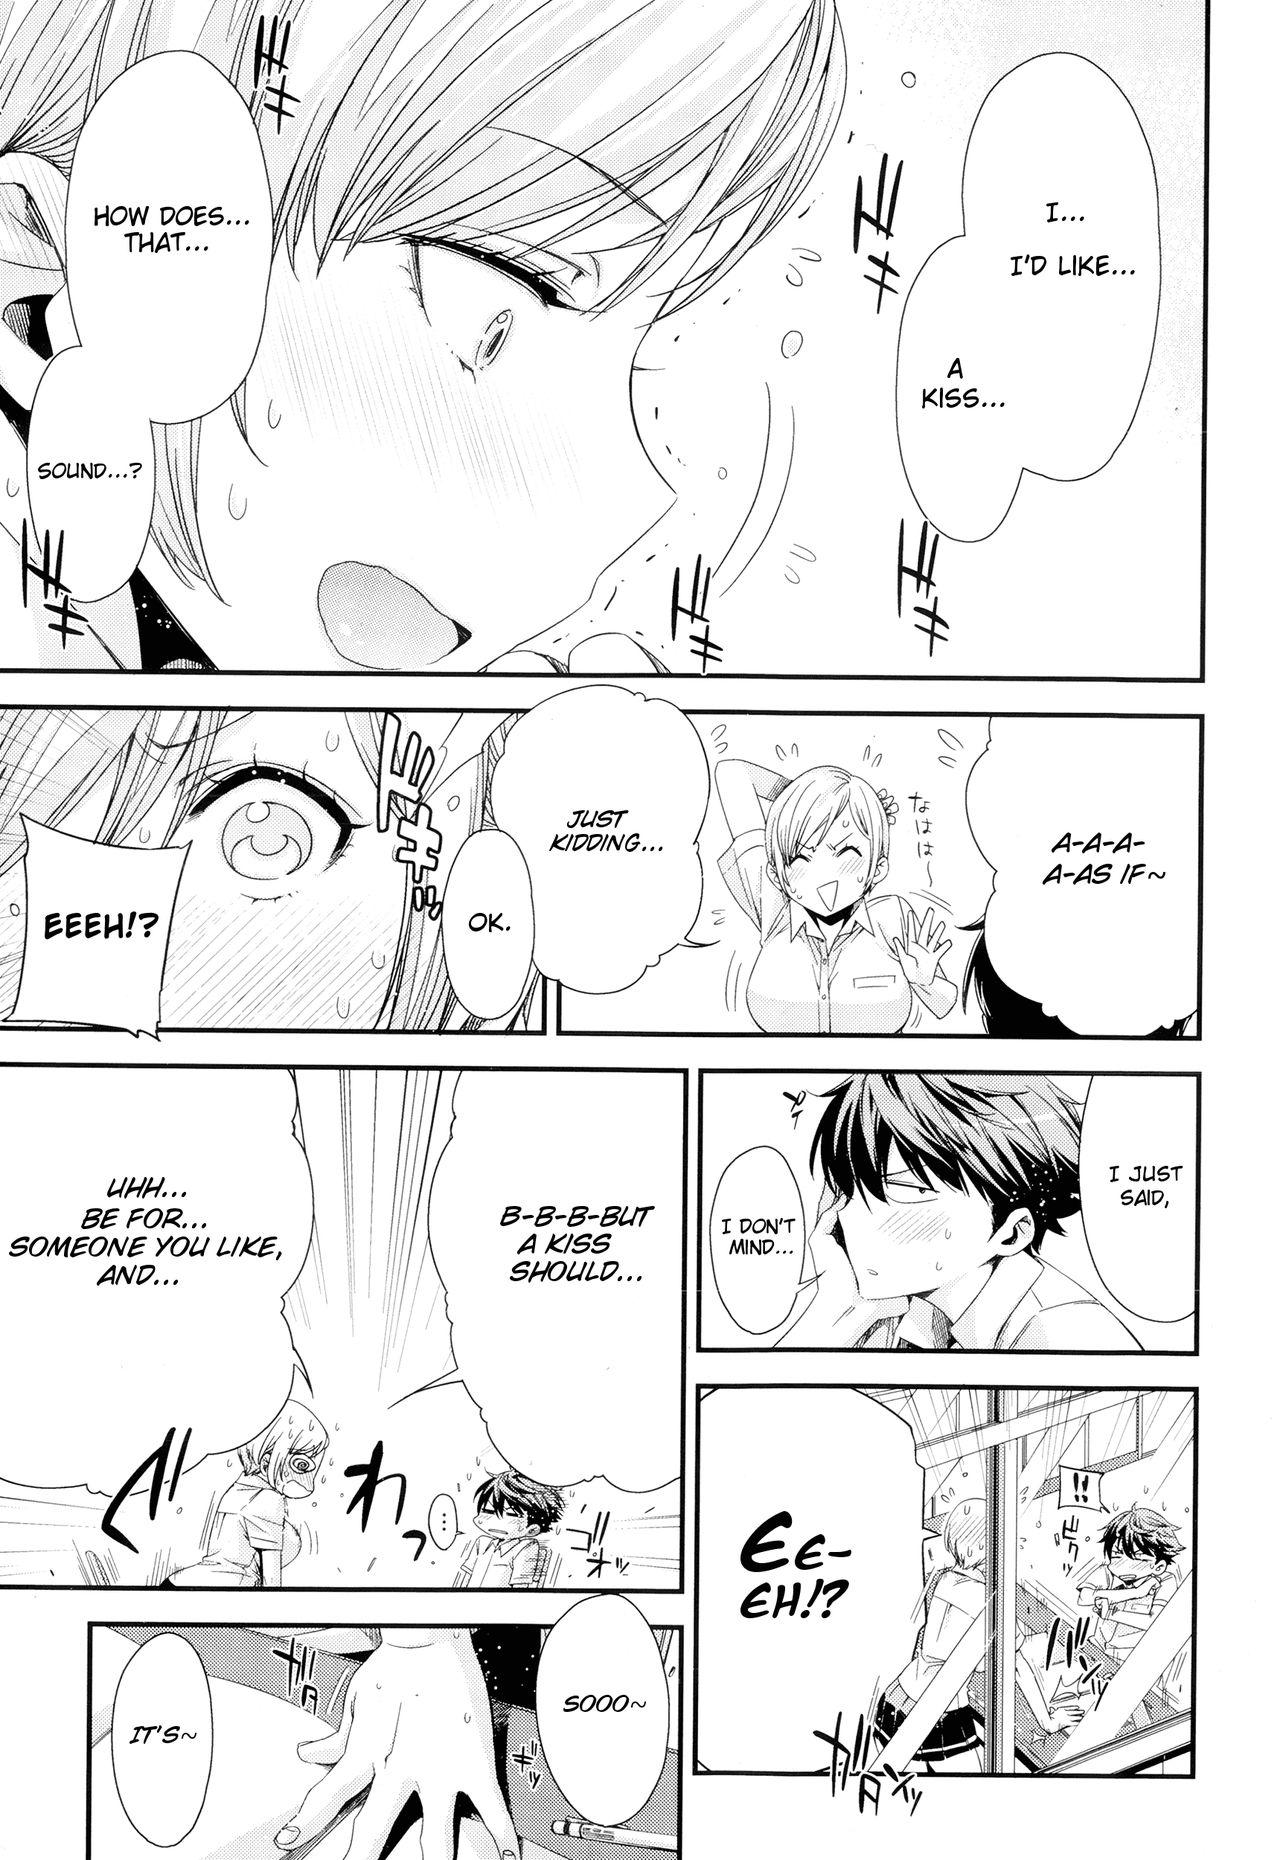 Tomodachi ja iya!   Don't wanna be friends! 6